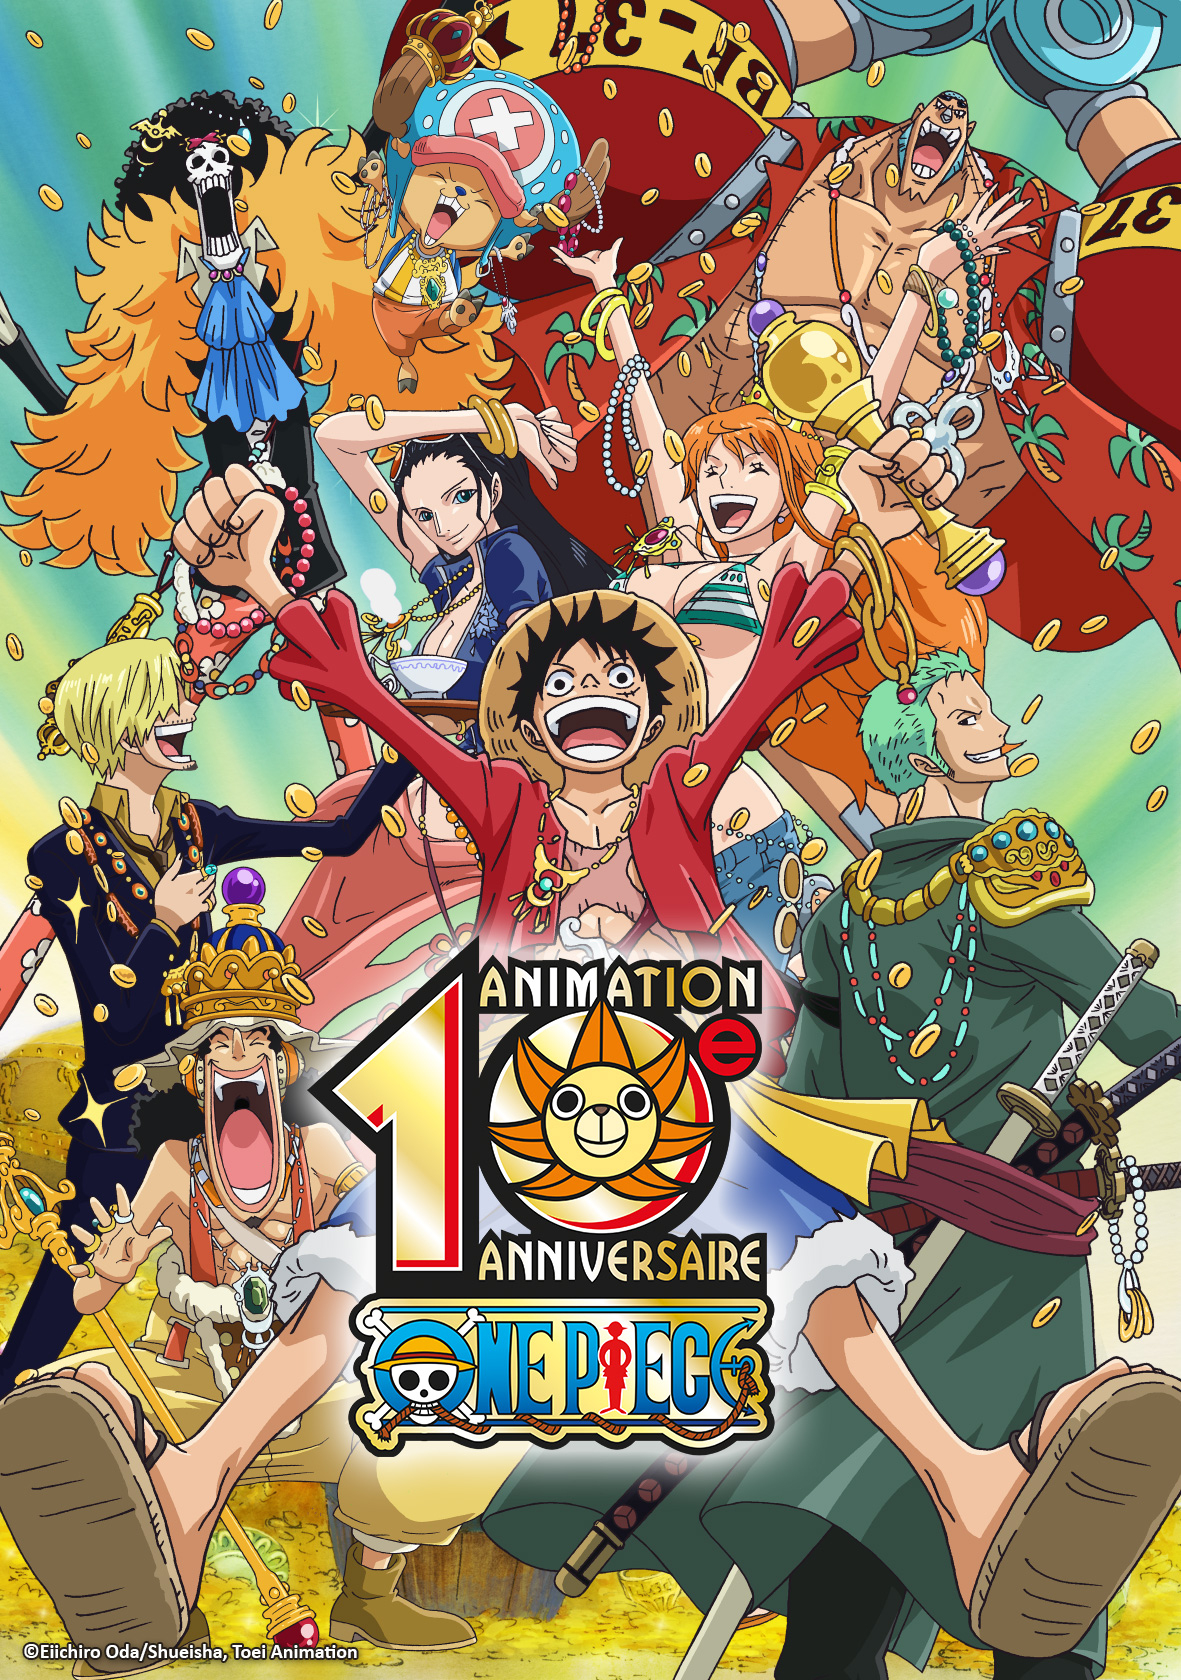 One Piece Au Musée De La Marine, 21 Octobre 2013 - Manga News dedans Dessin Animé De One Piece